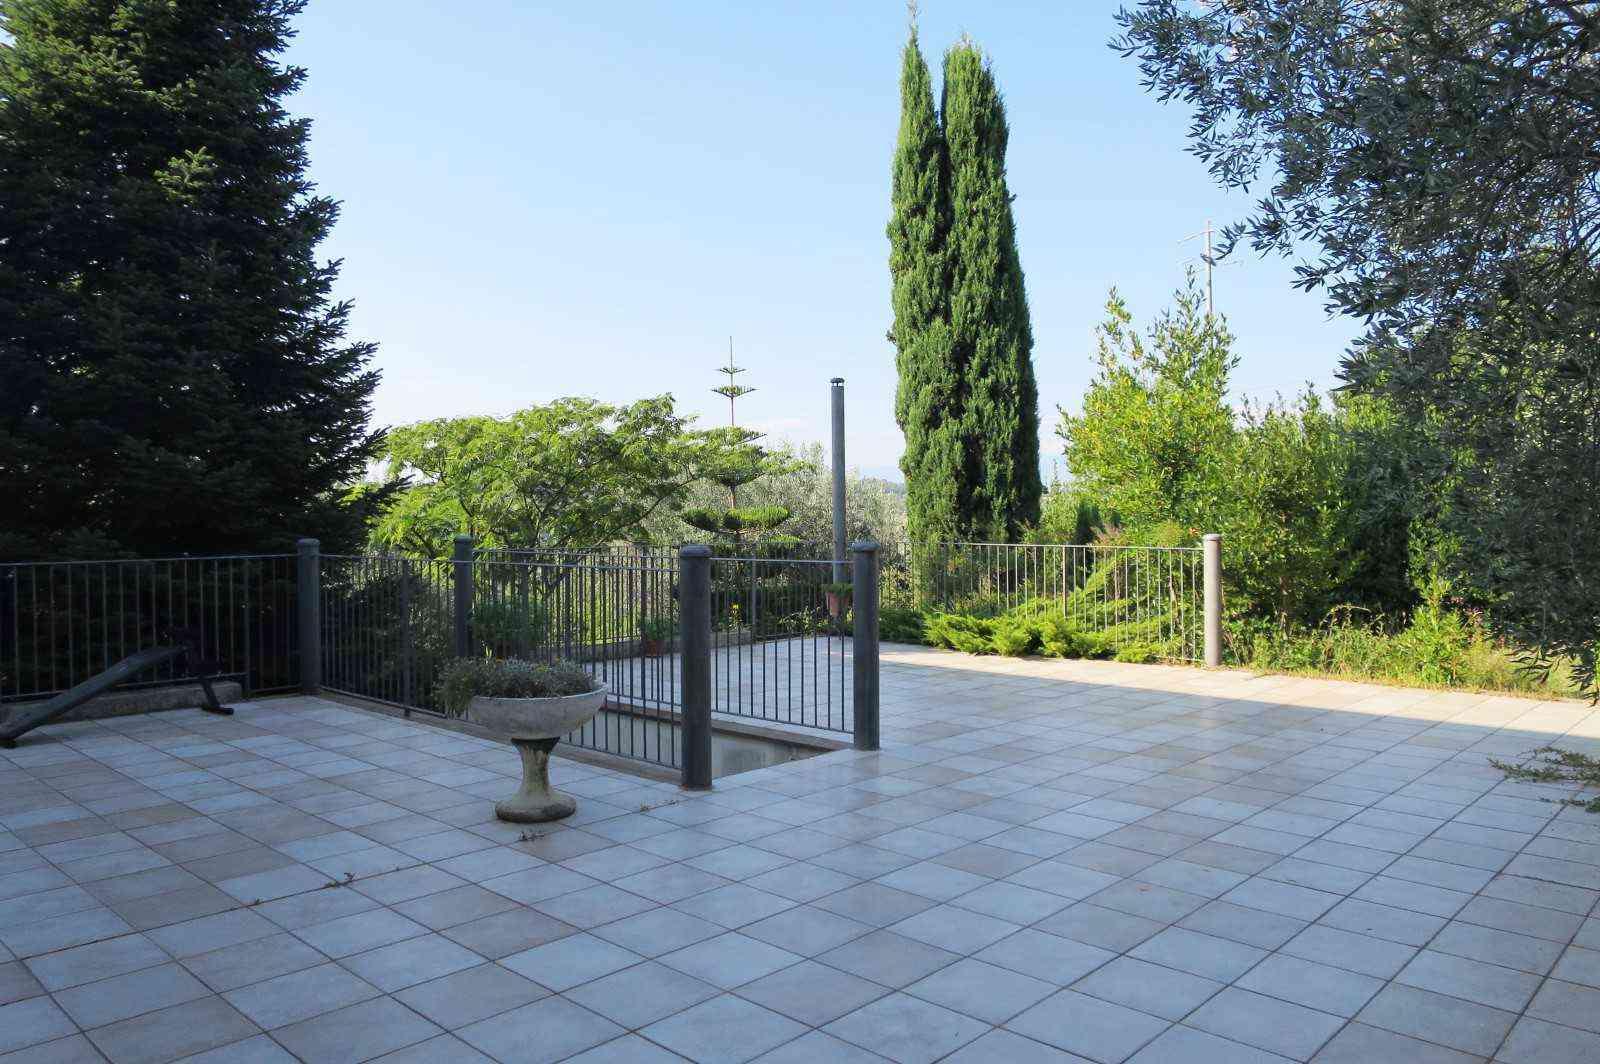 Villa Villa in vendita Atri (TE), Villa Paola - Atri - EUR 473.281 230